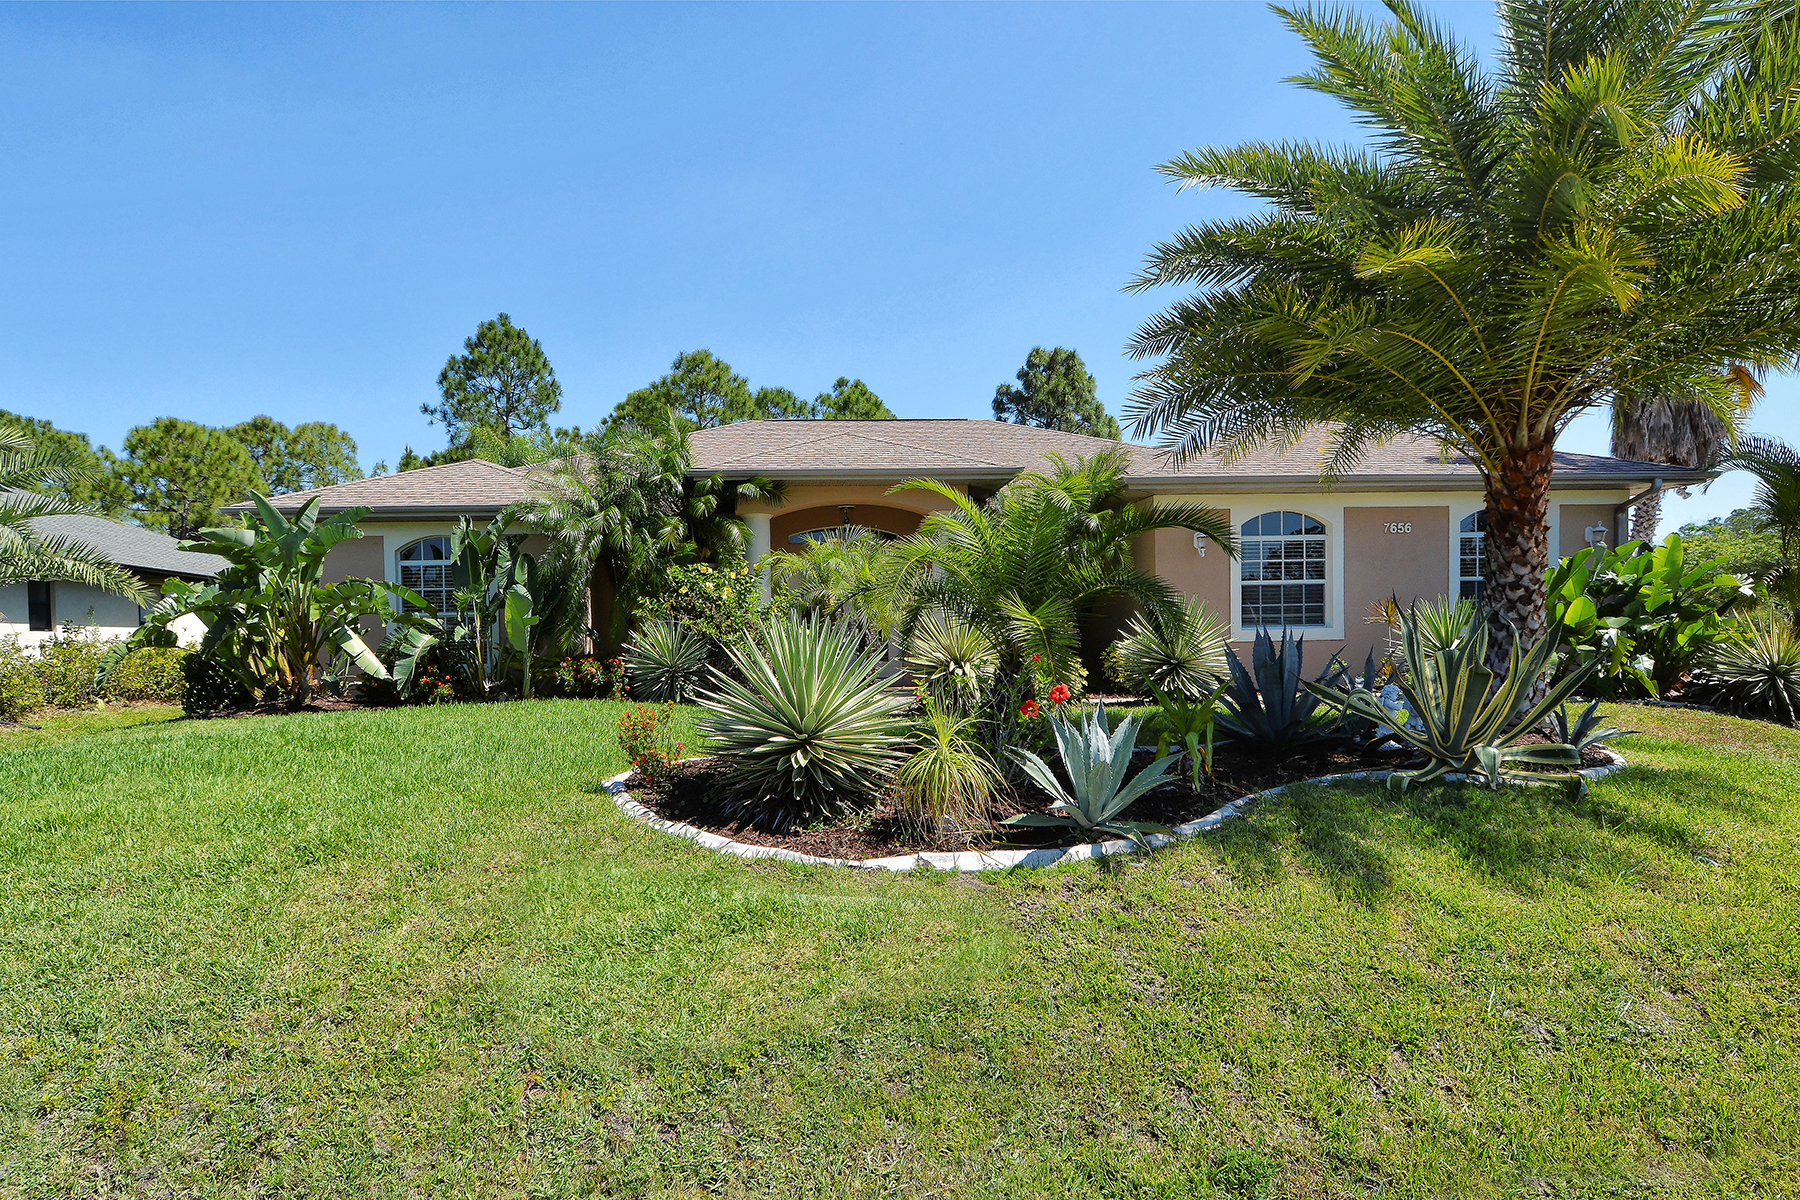 獨棟家庭住宅 為 出售 在 NORTH PORT 7656 Veterans Pkwy North Port, 佛羅里達州, 34288 美國